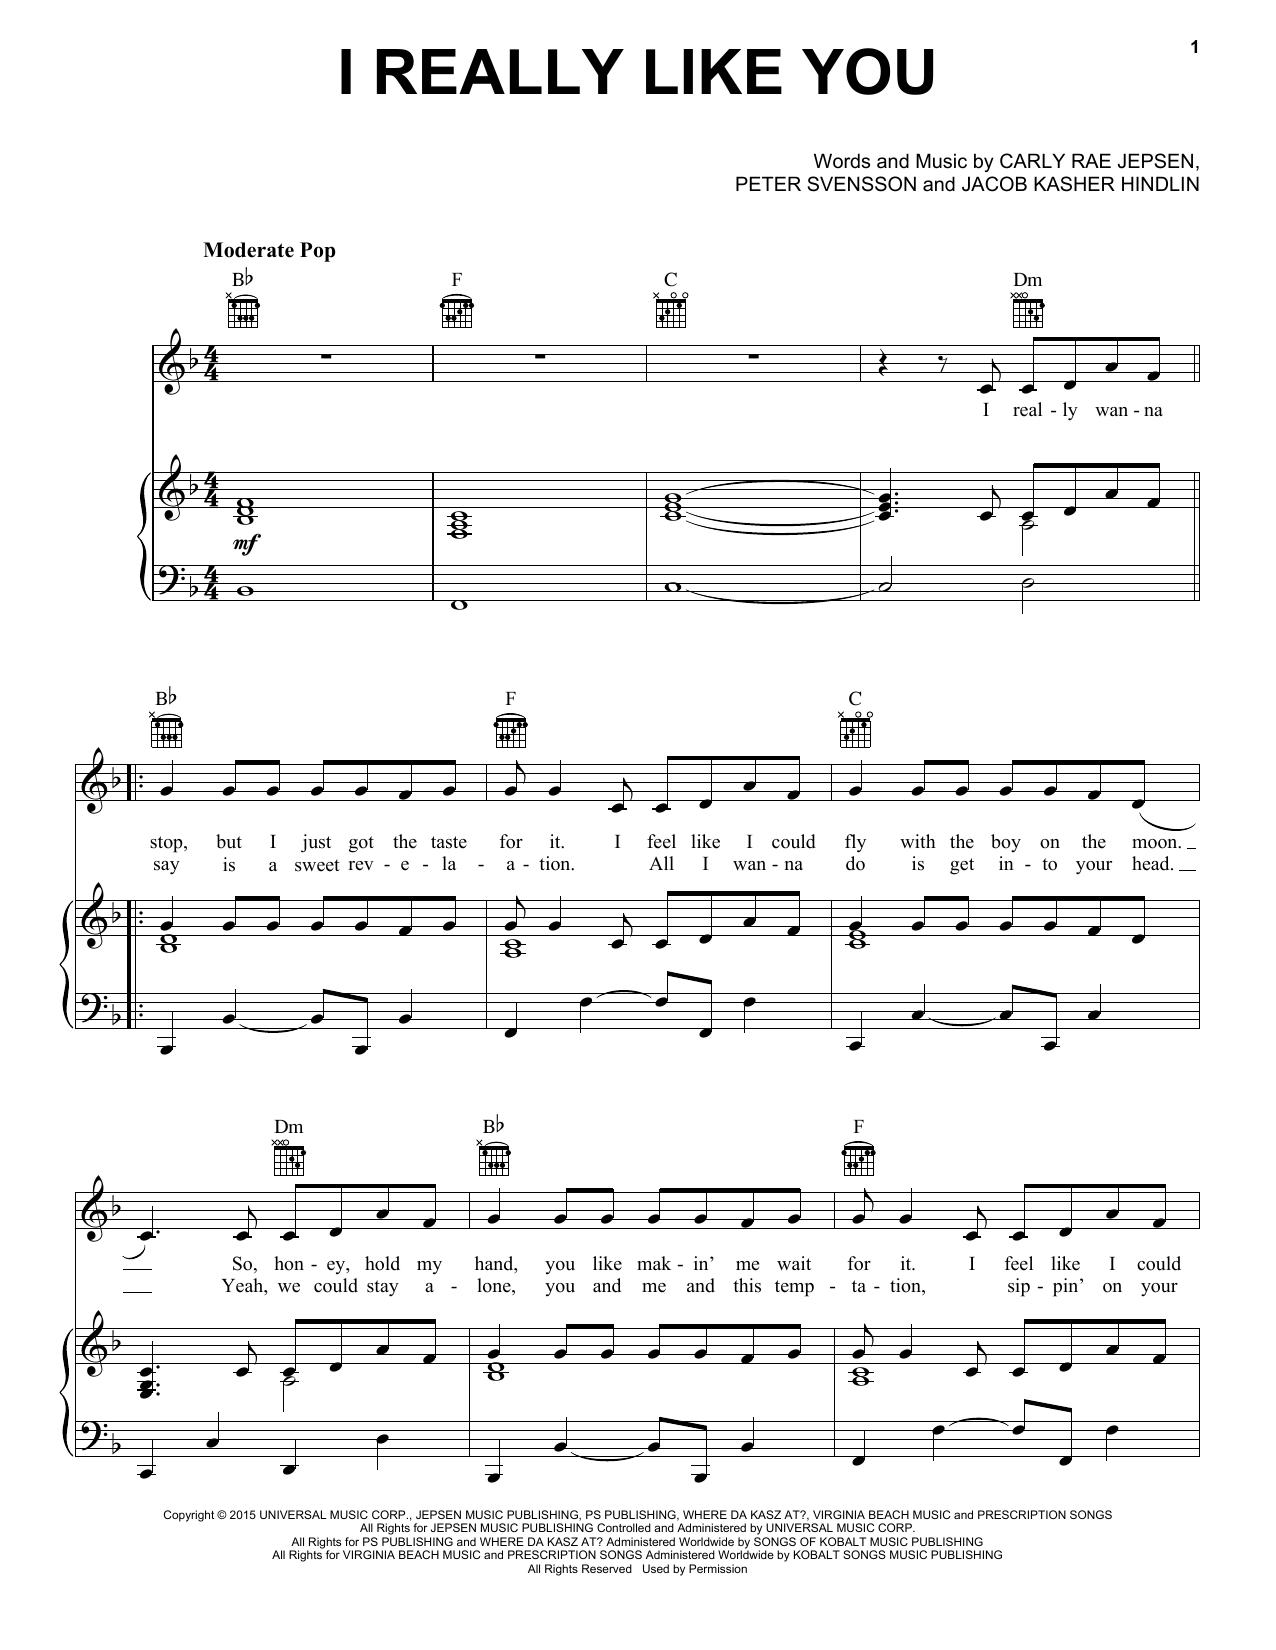 I Really Like You Sheet Music Carly Rae Jepsen Piano Vocal Guitar Right Hand Melody Sheet Music Digital Sheet Music Sheet Music Direct